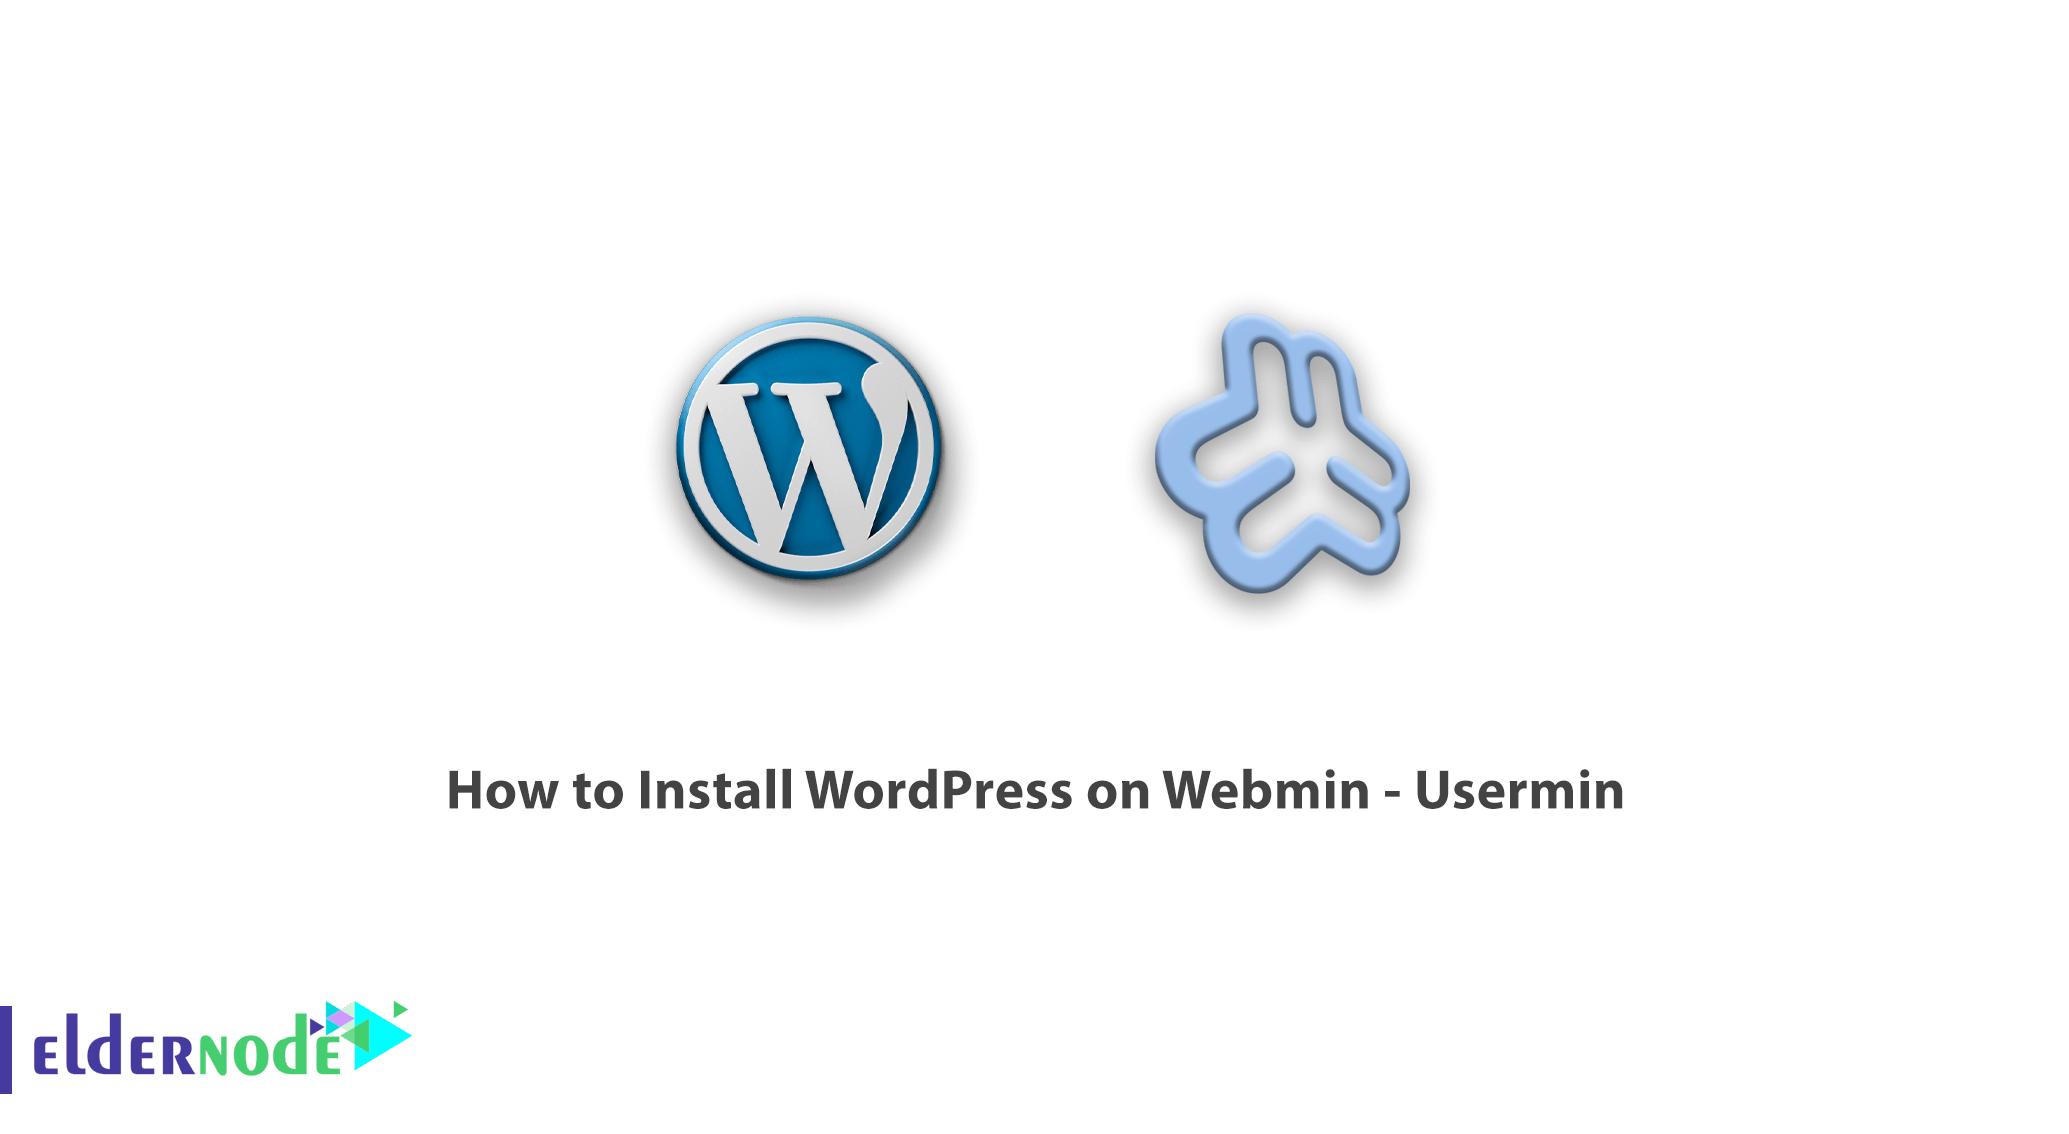 How to Install WordPress on Webmin - Usermin